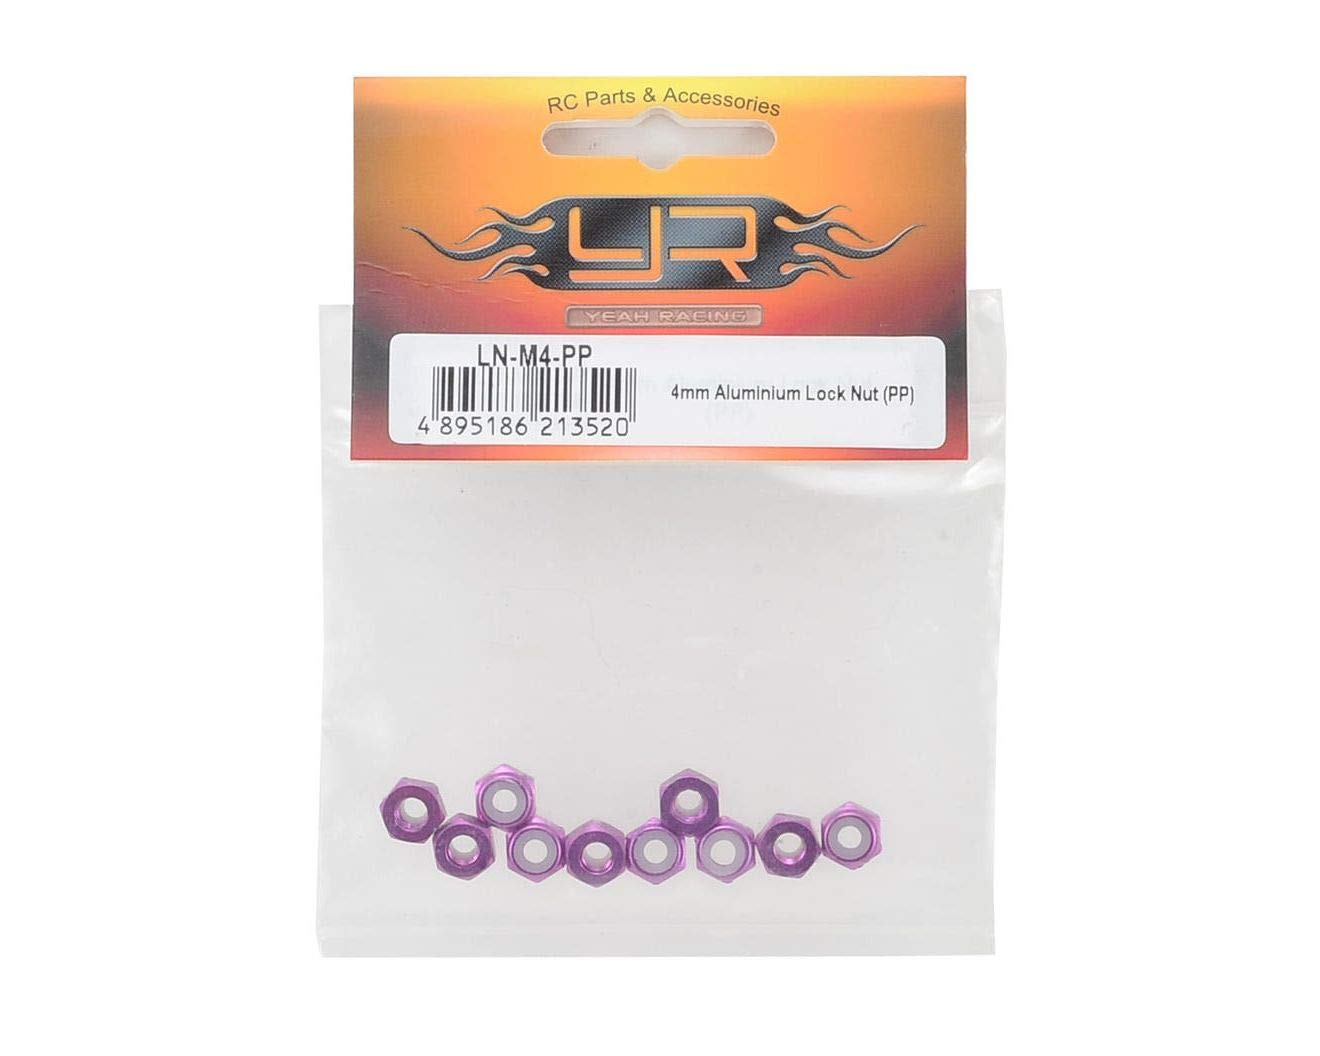 YEA-LN-M4-PP for 4mm Aluminum Lock Nut 10 YEALNM4PP Purple